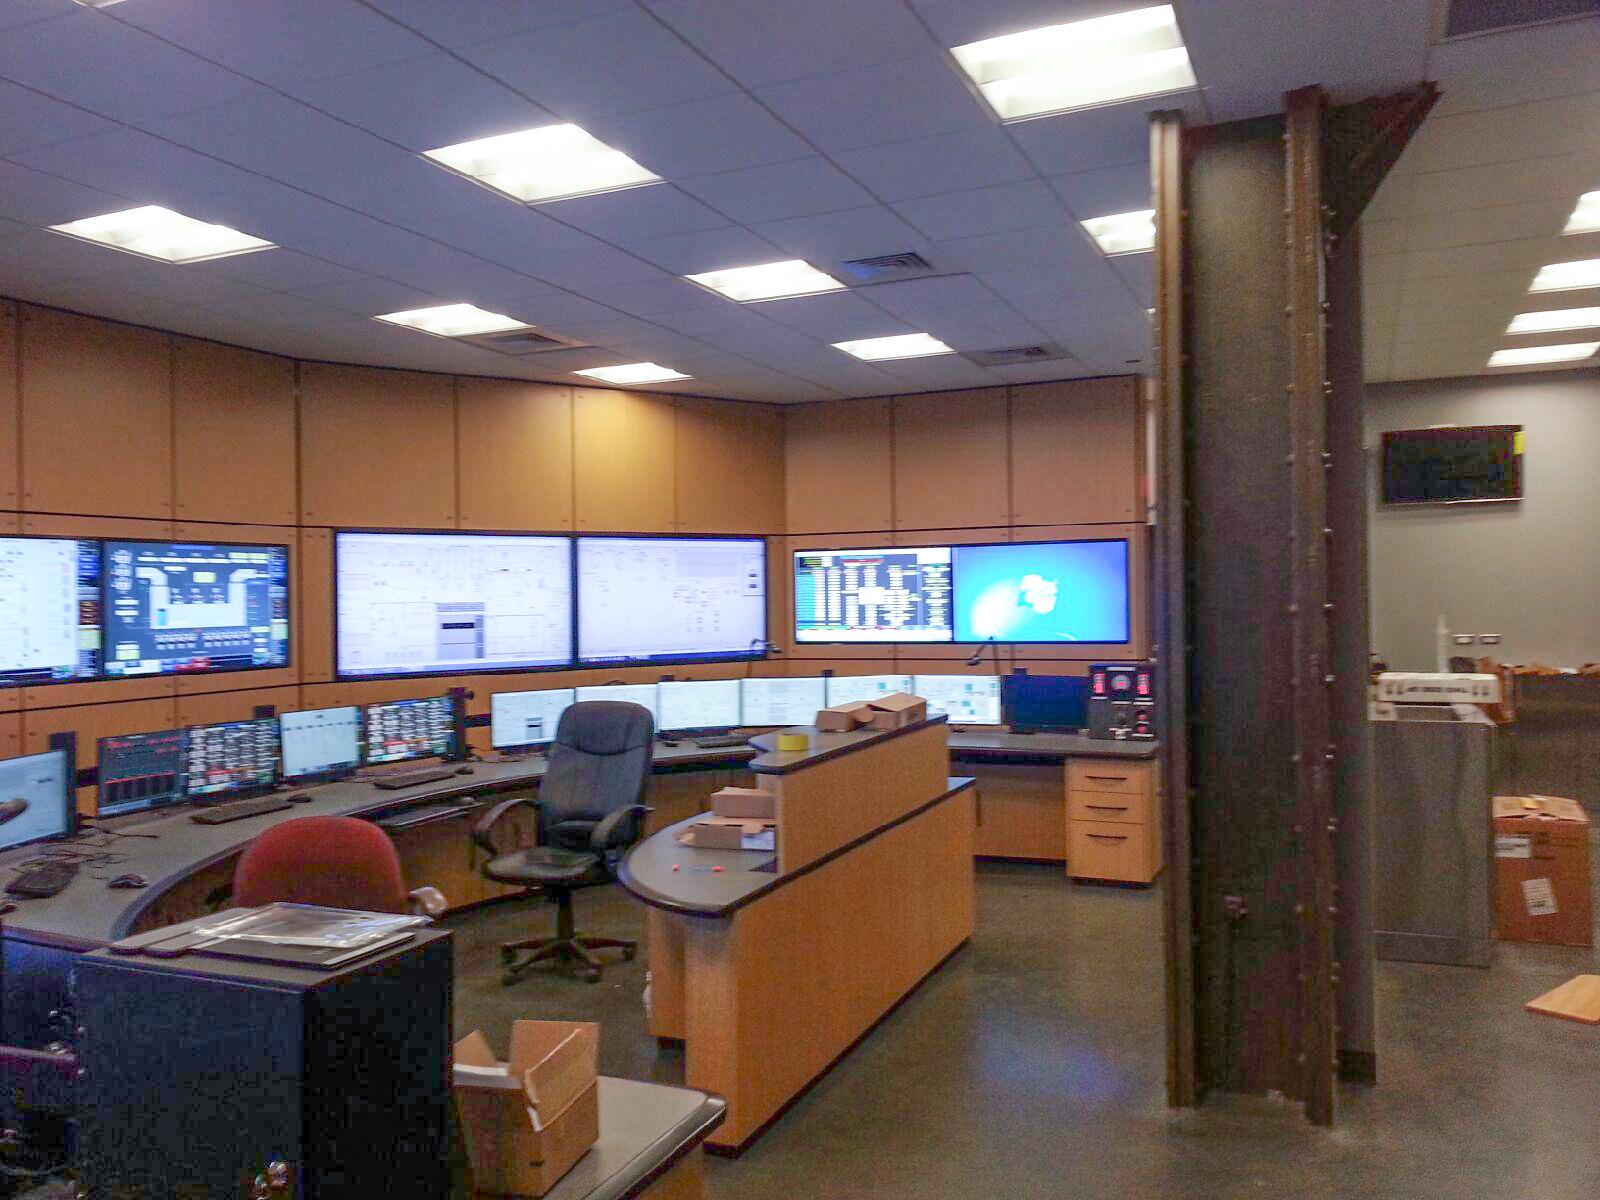 Alabama Power – Instrumentation and Control Room Renovation